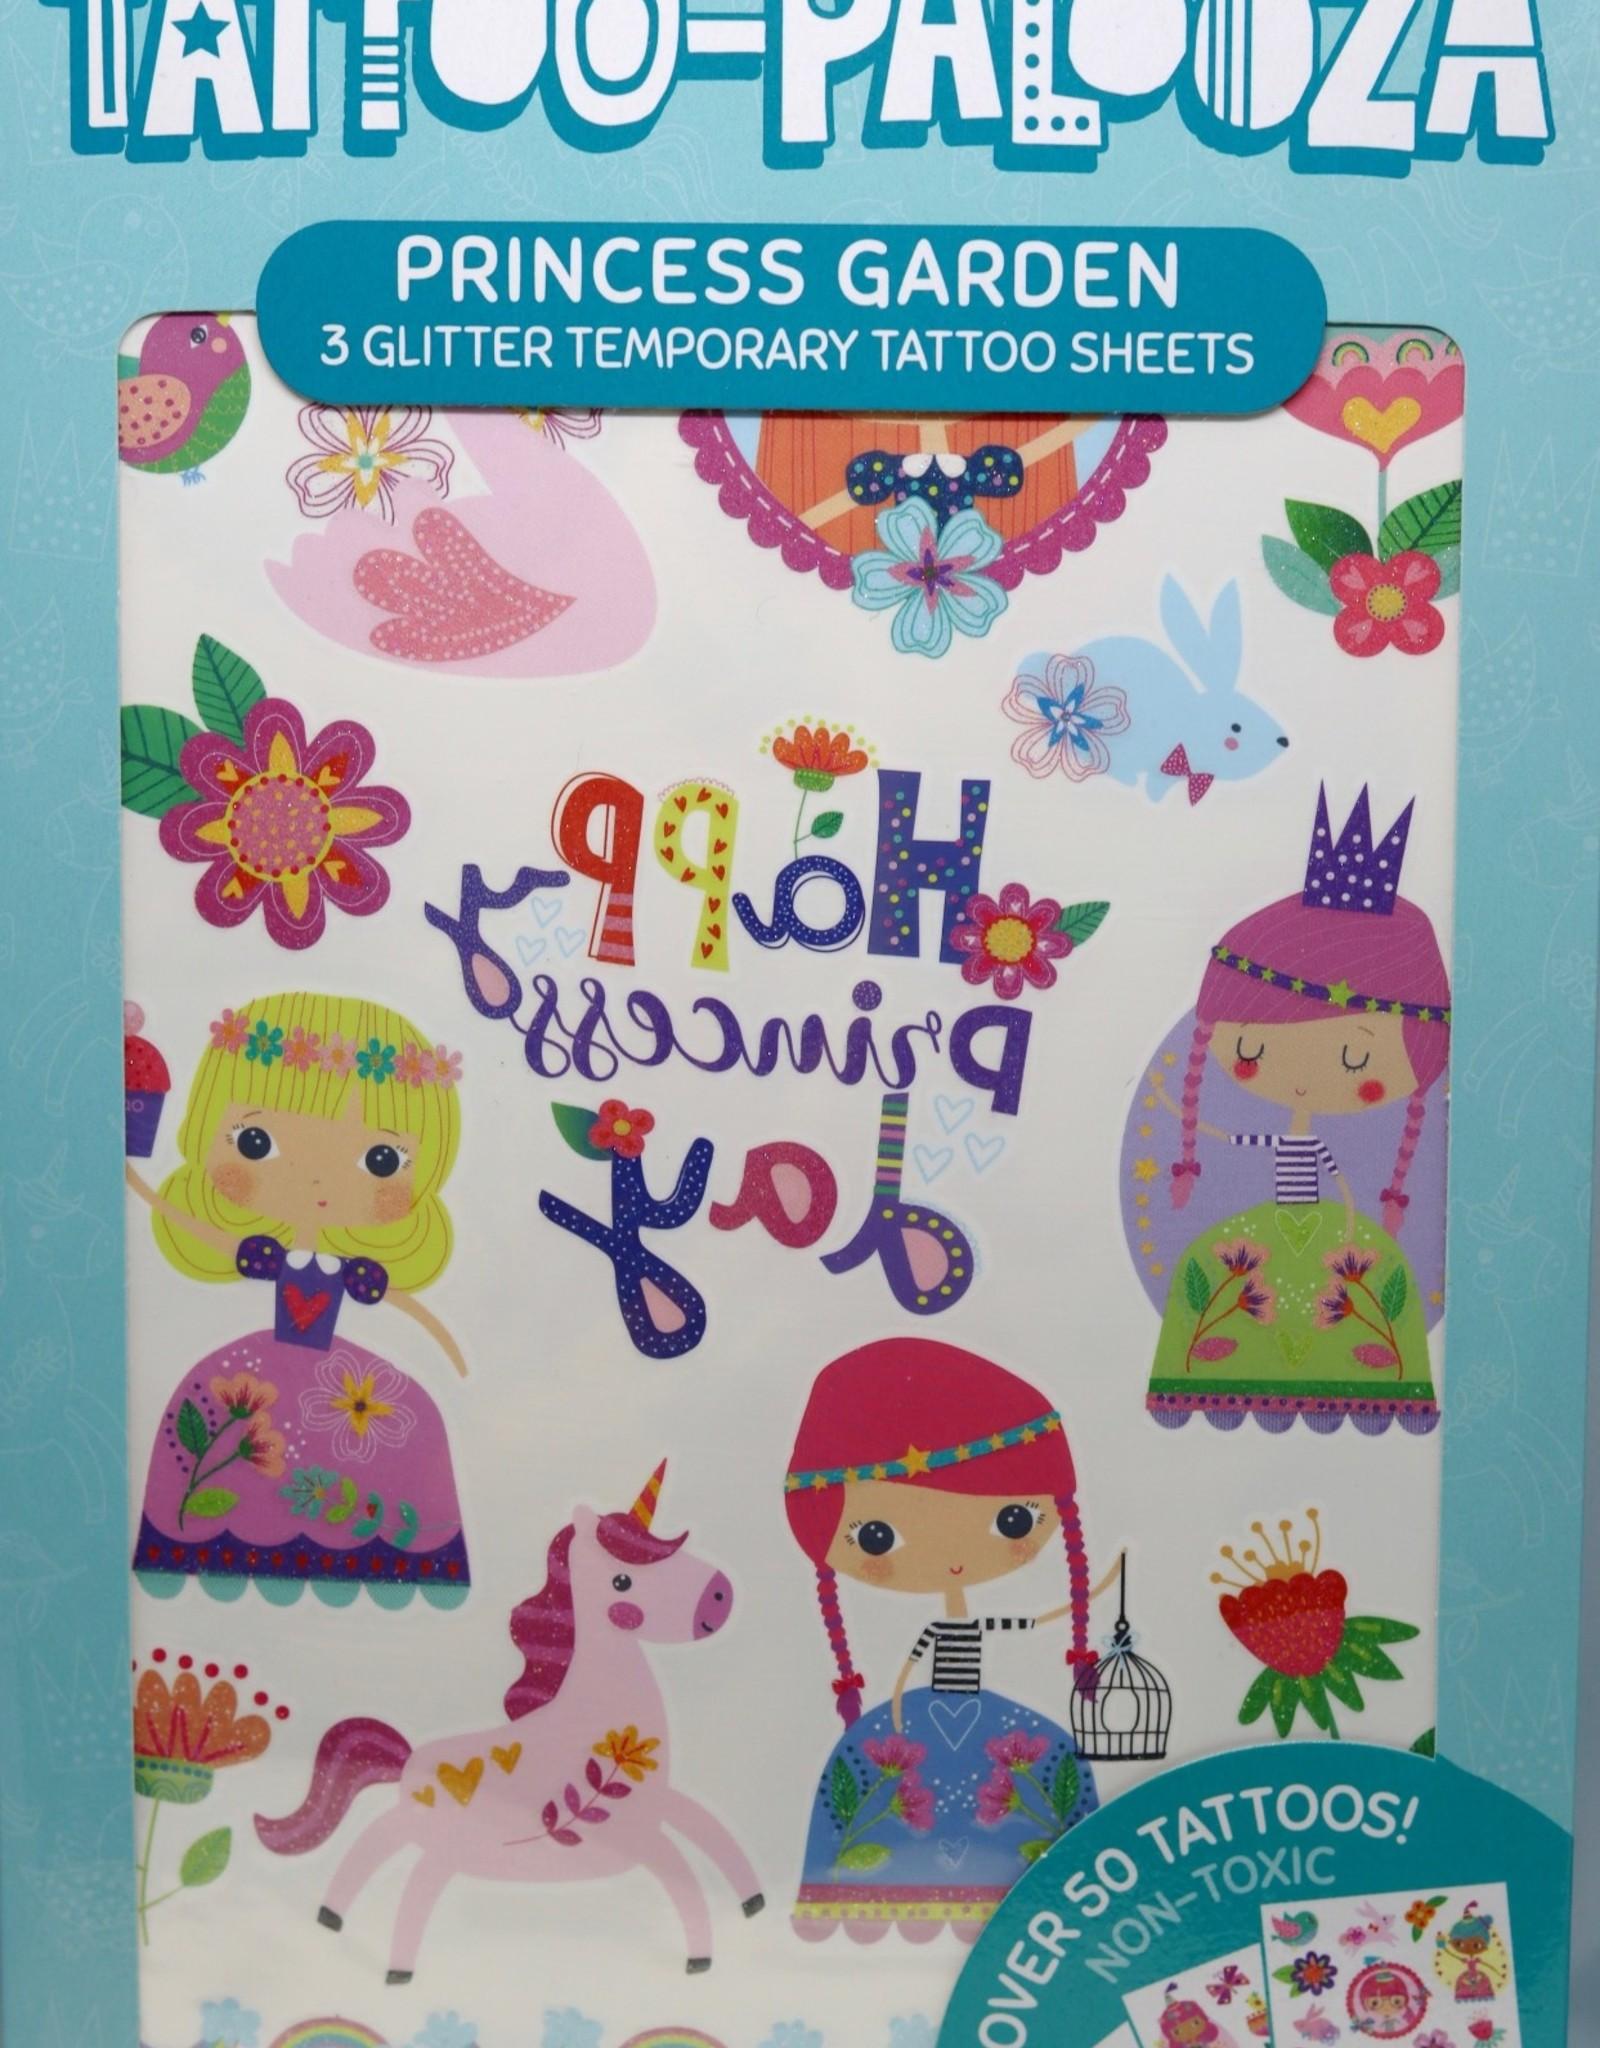 OOLY Tattoo Palooza-Princess Garden